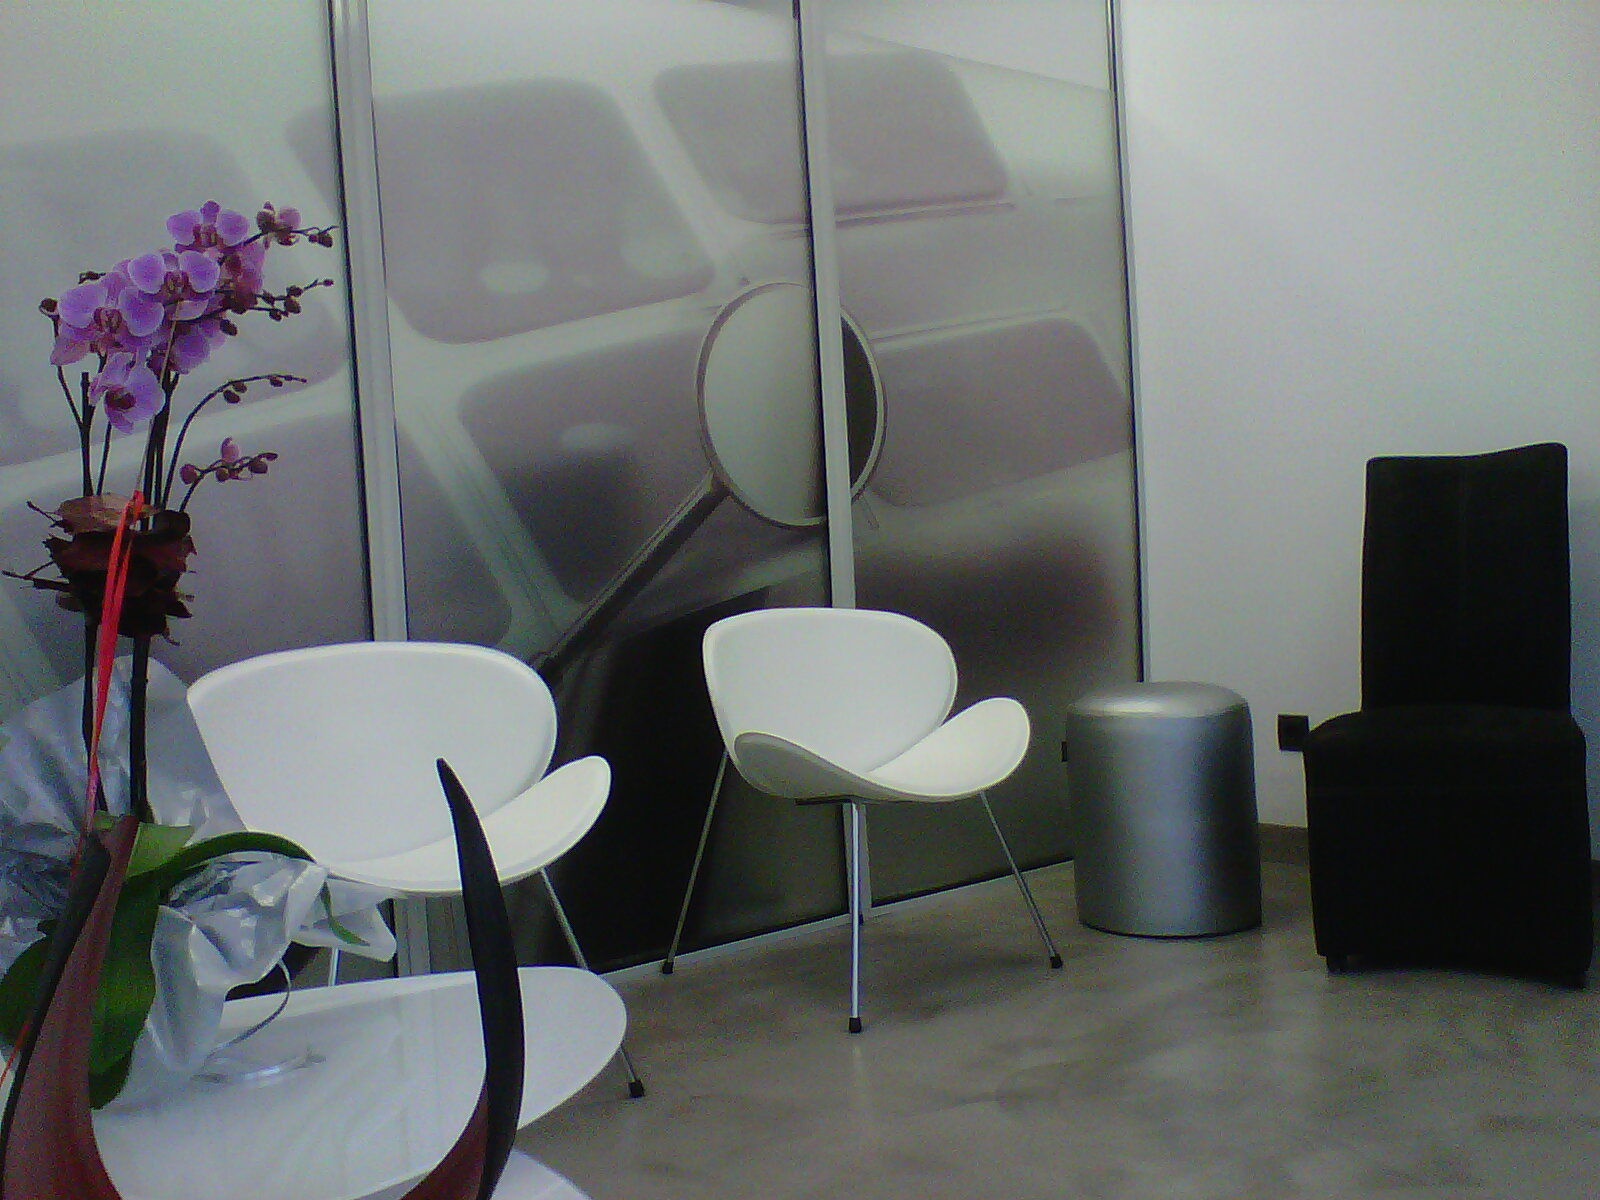 Foto 55 de Dentistas en Avilés | Centro Dental Innova